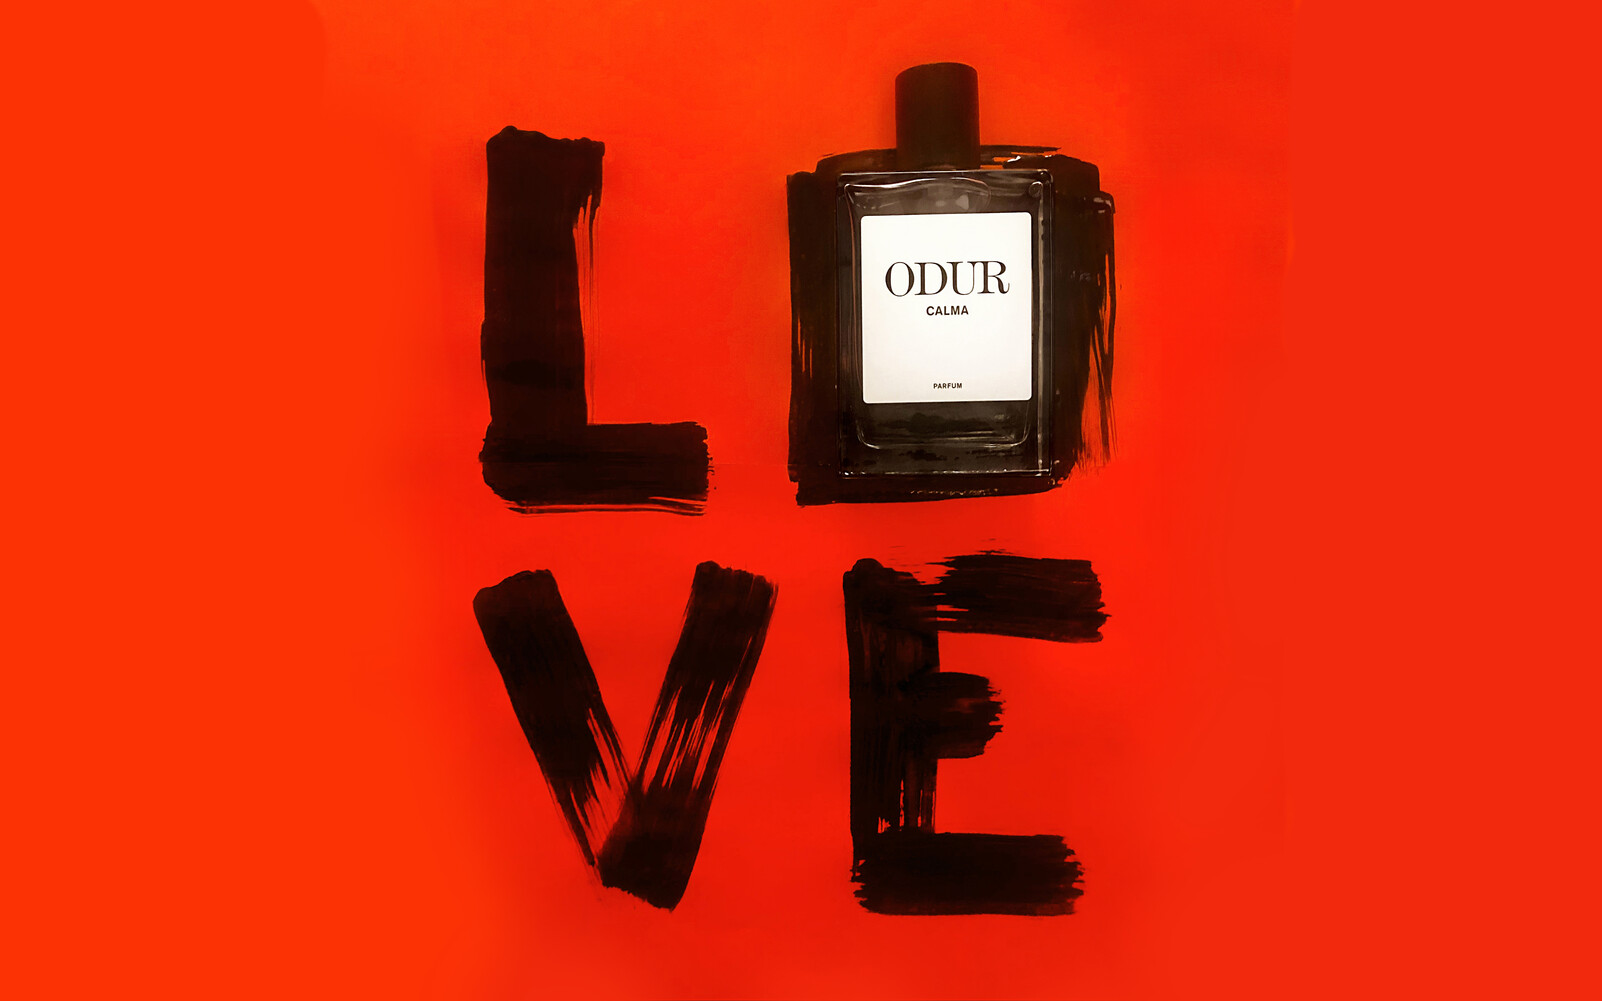 ODUR Parfum